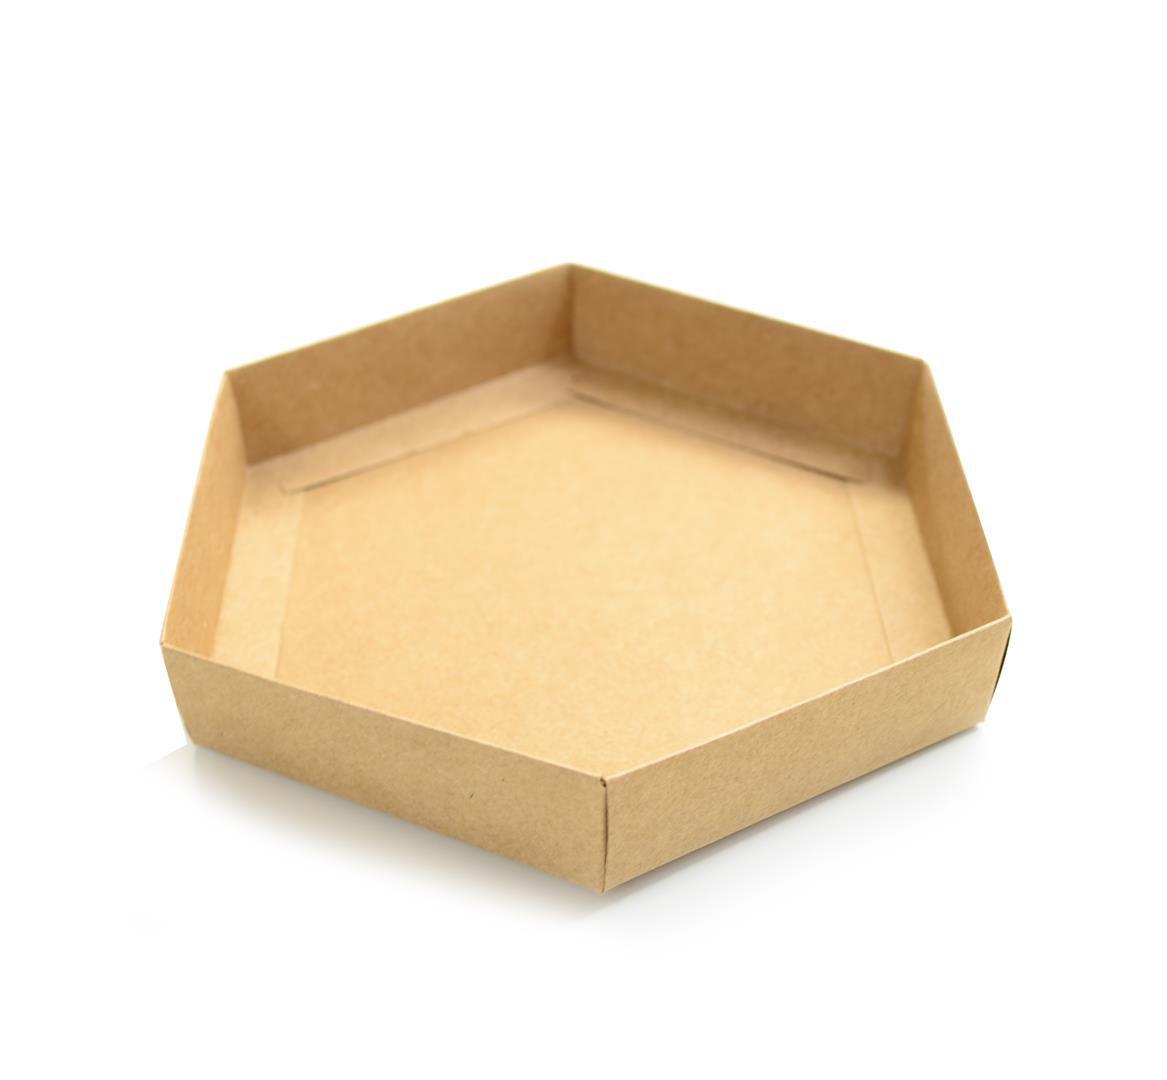 F018 - Fundo - 10x3 cm